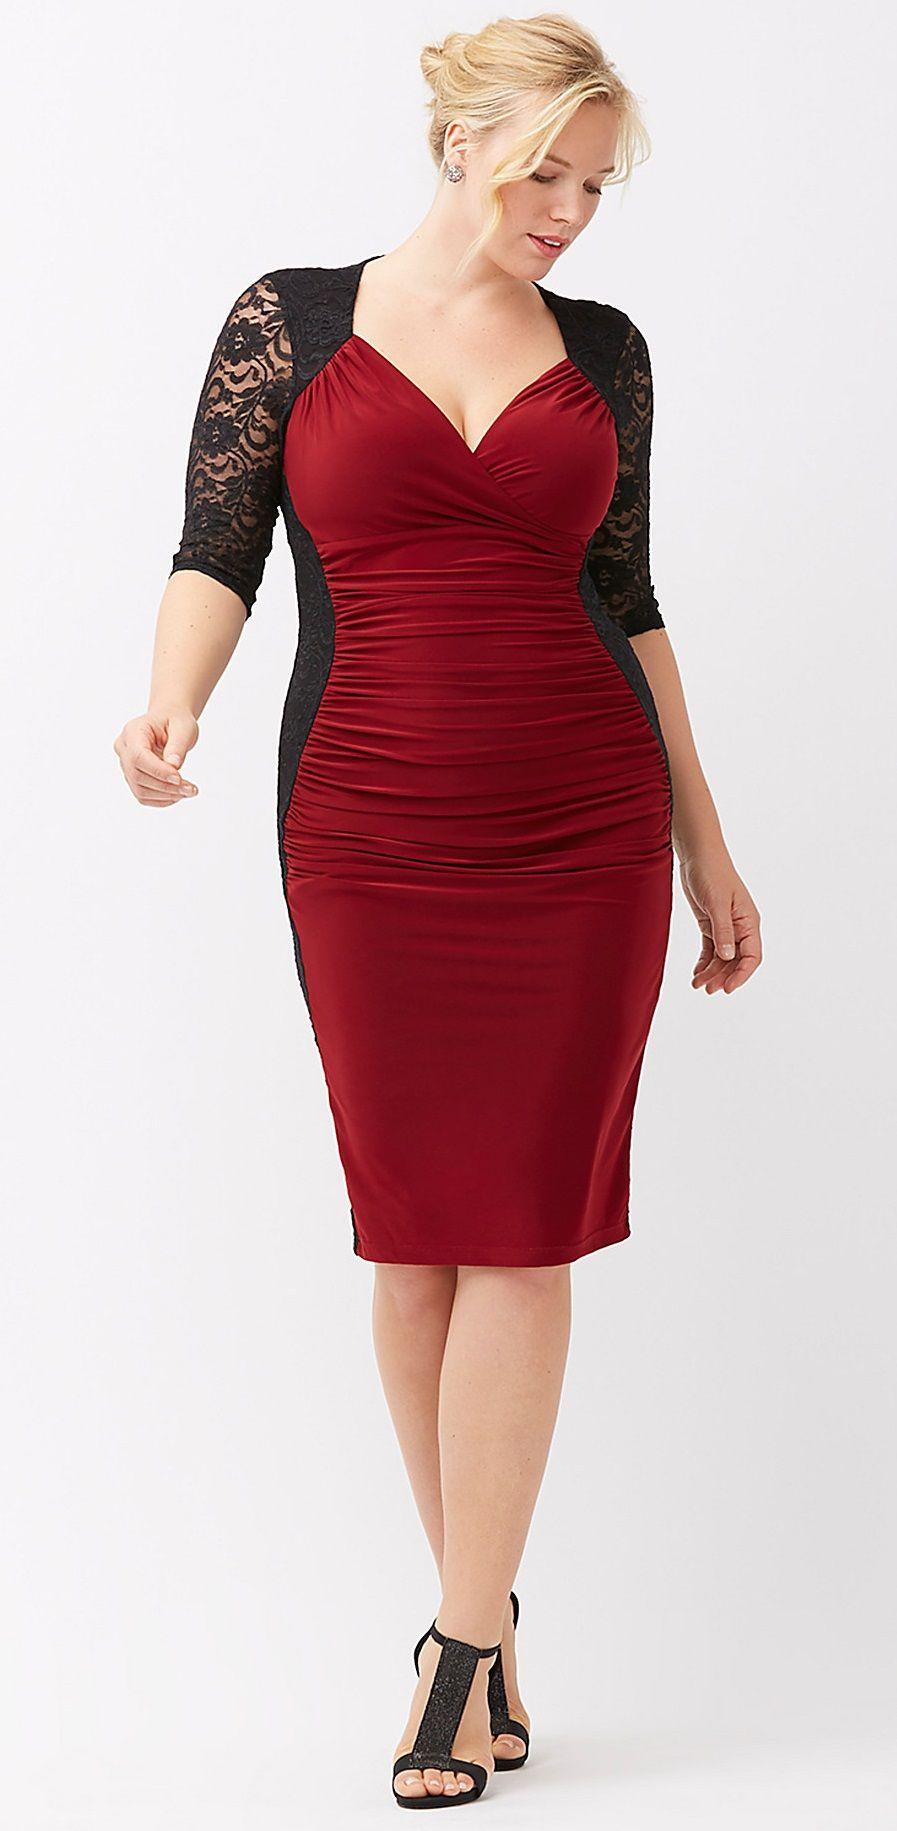 Plus Size Valentine\'s Day Date Dress - Plus Size Lace Illusion Dress ...